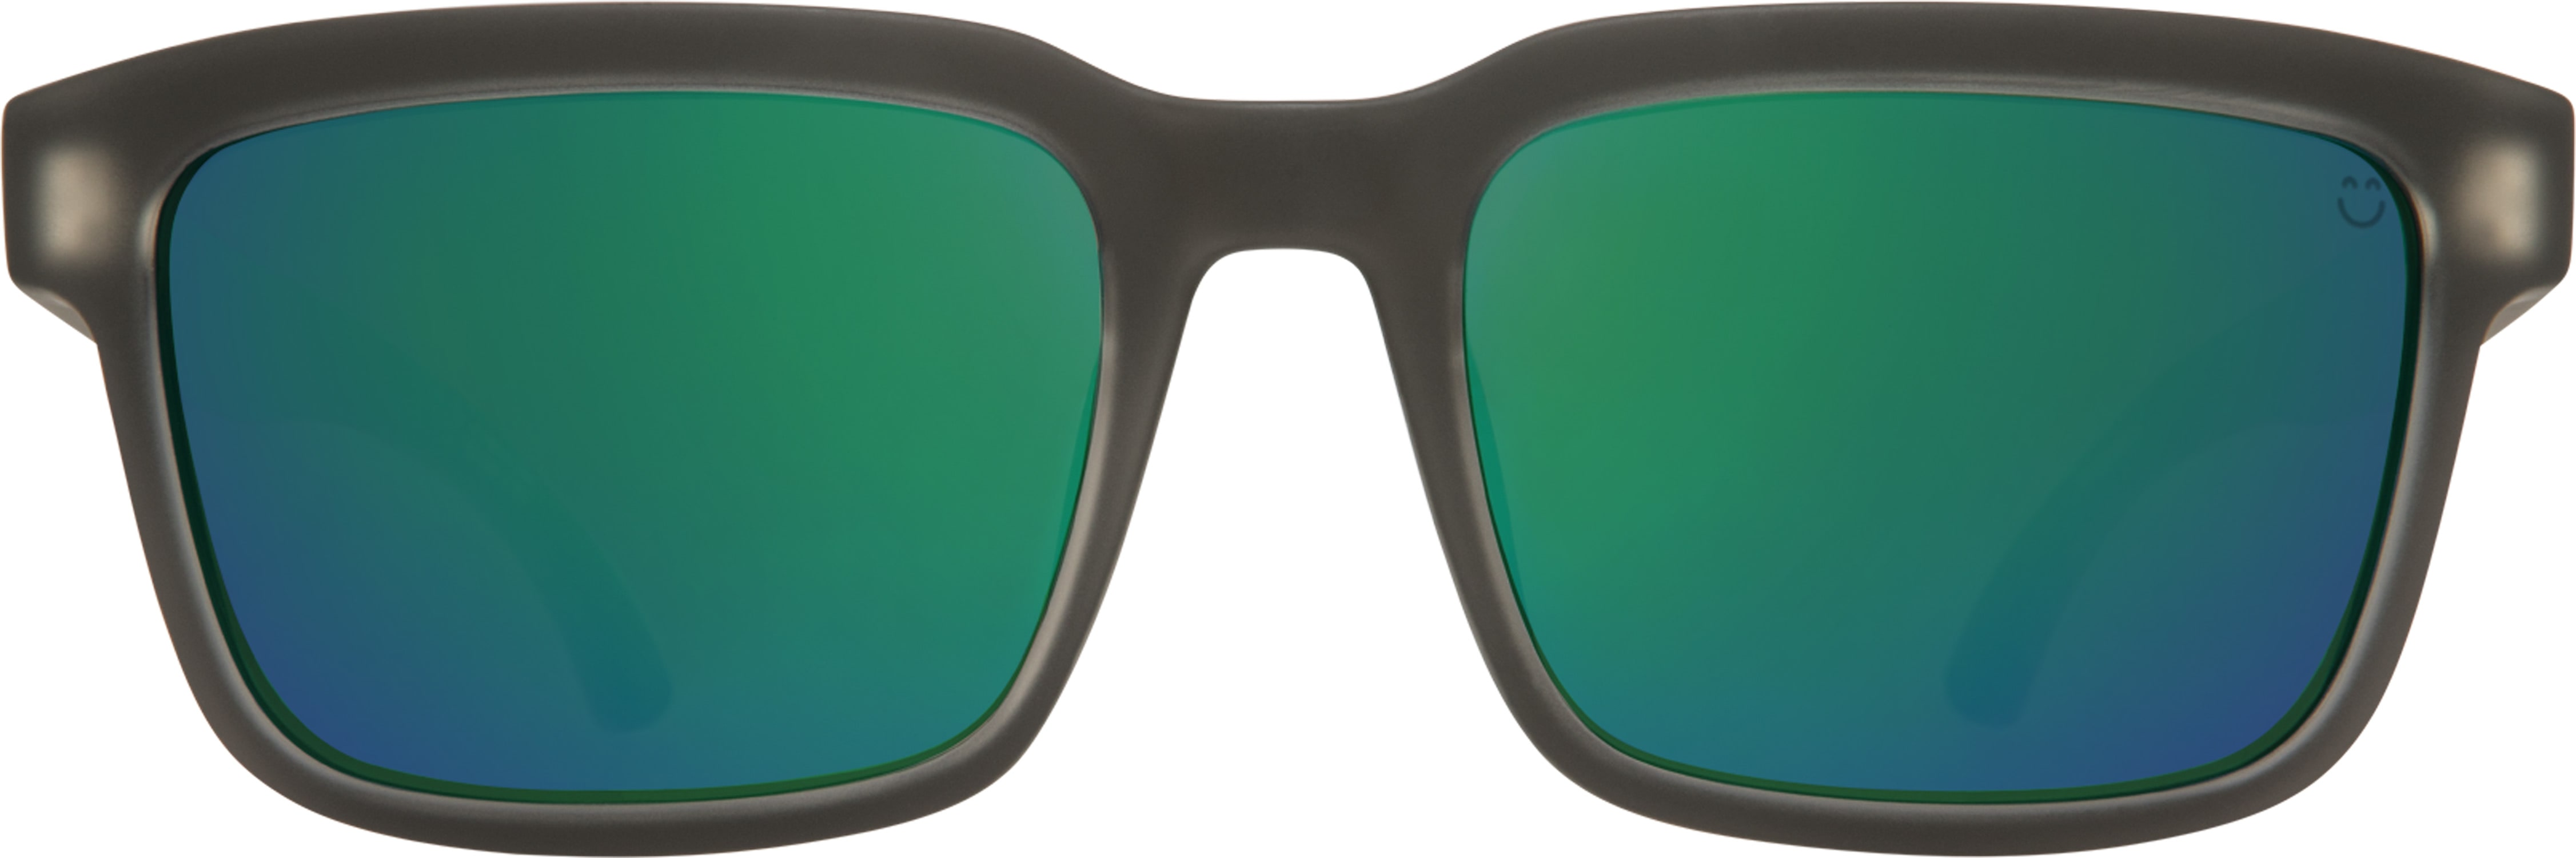 fffea8e1244 Spy Helm 2 Sunglasses - thumbnail 2